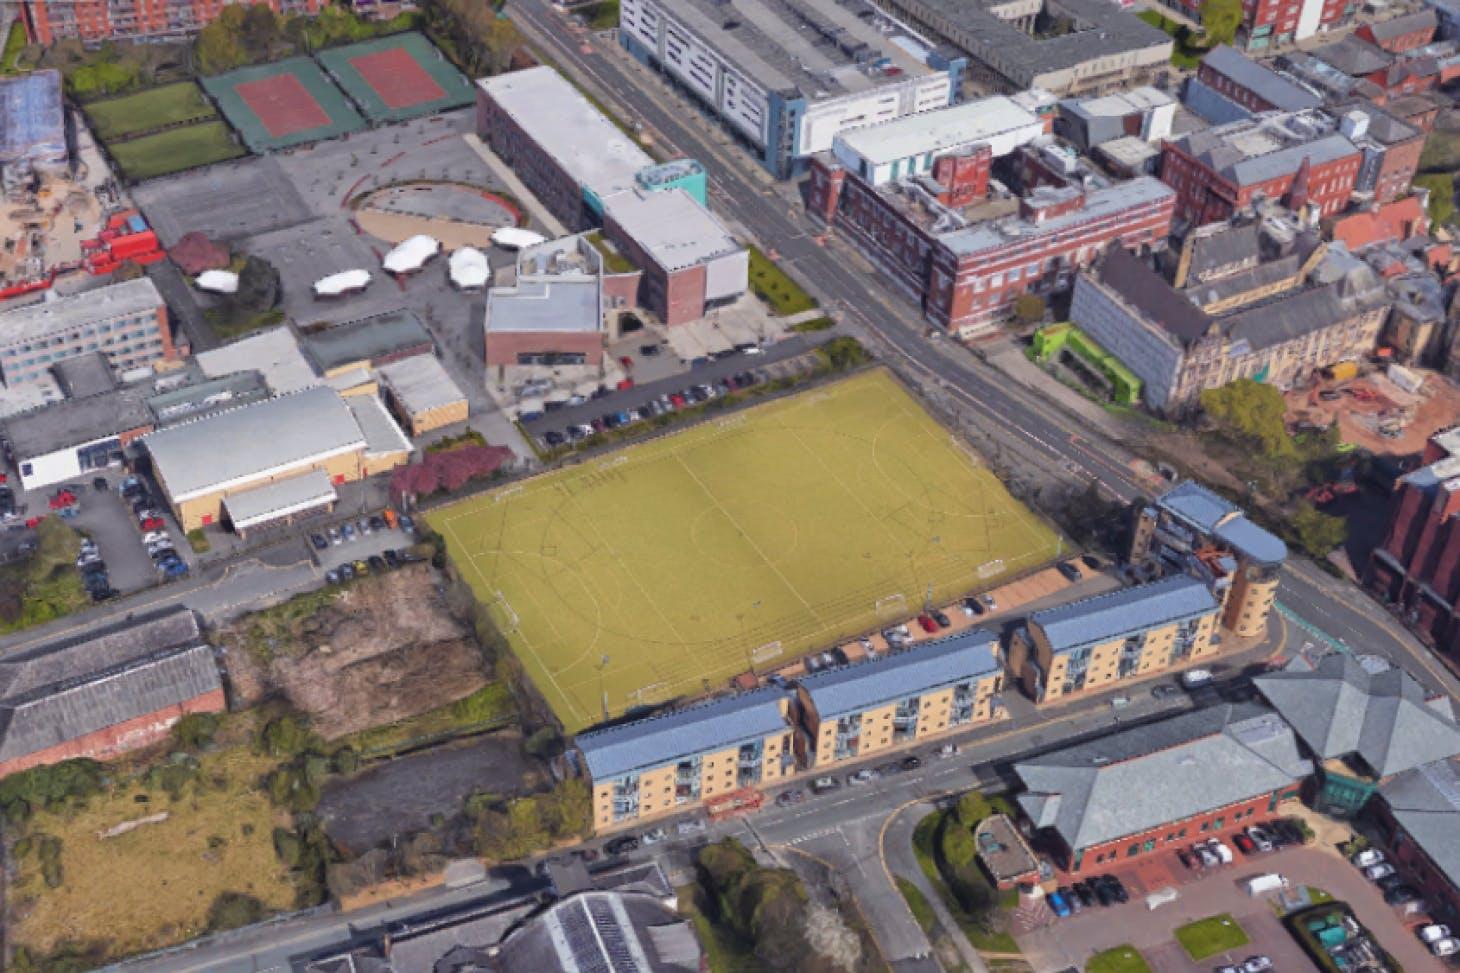 Trinity Sports Centre 5 a side | Astroturf football pitch